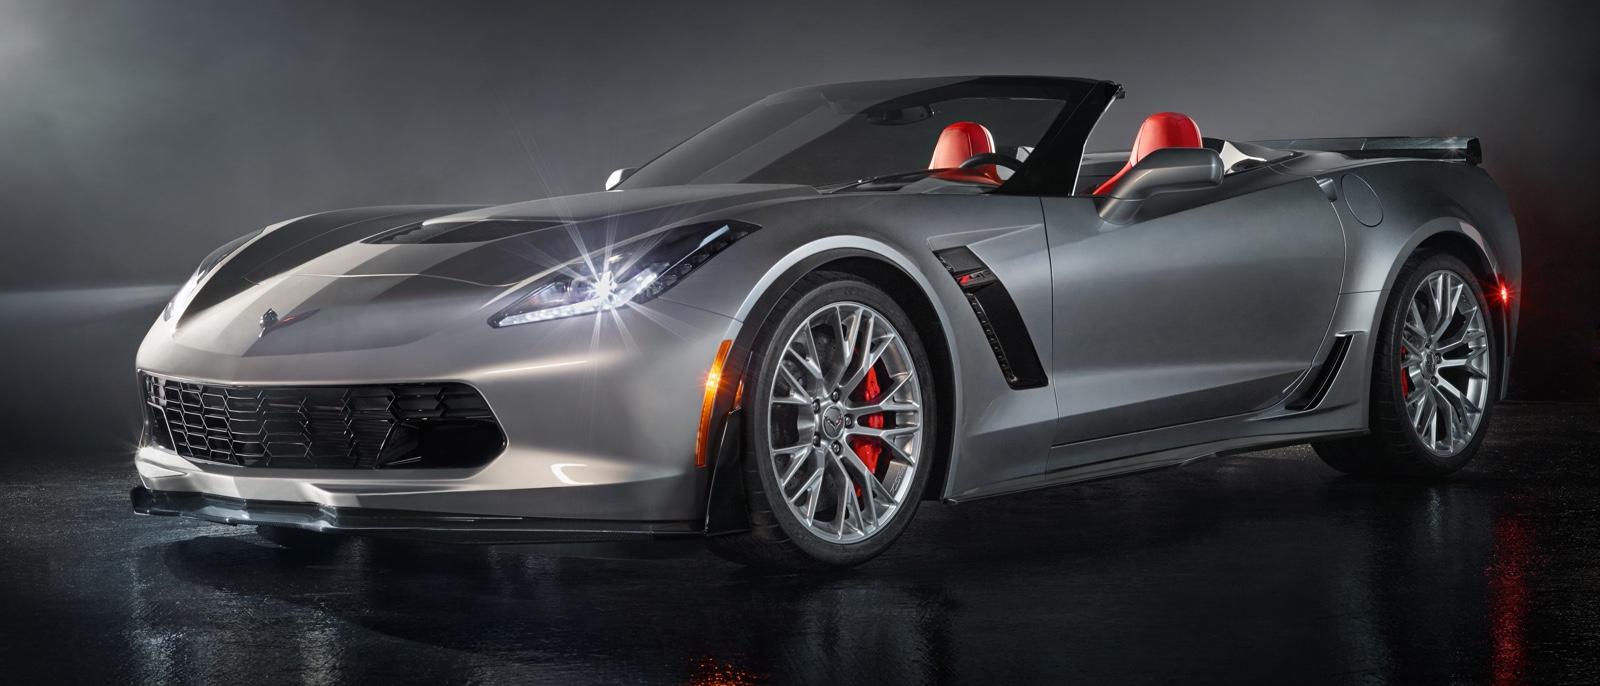 The 2015 Corvette Z06 Convertible